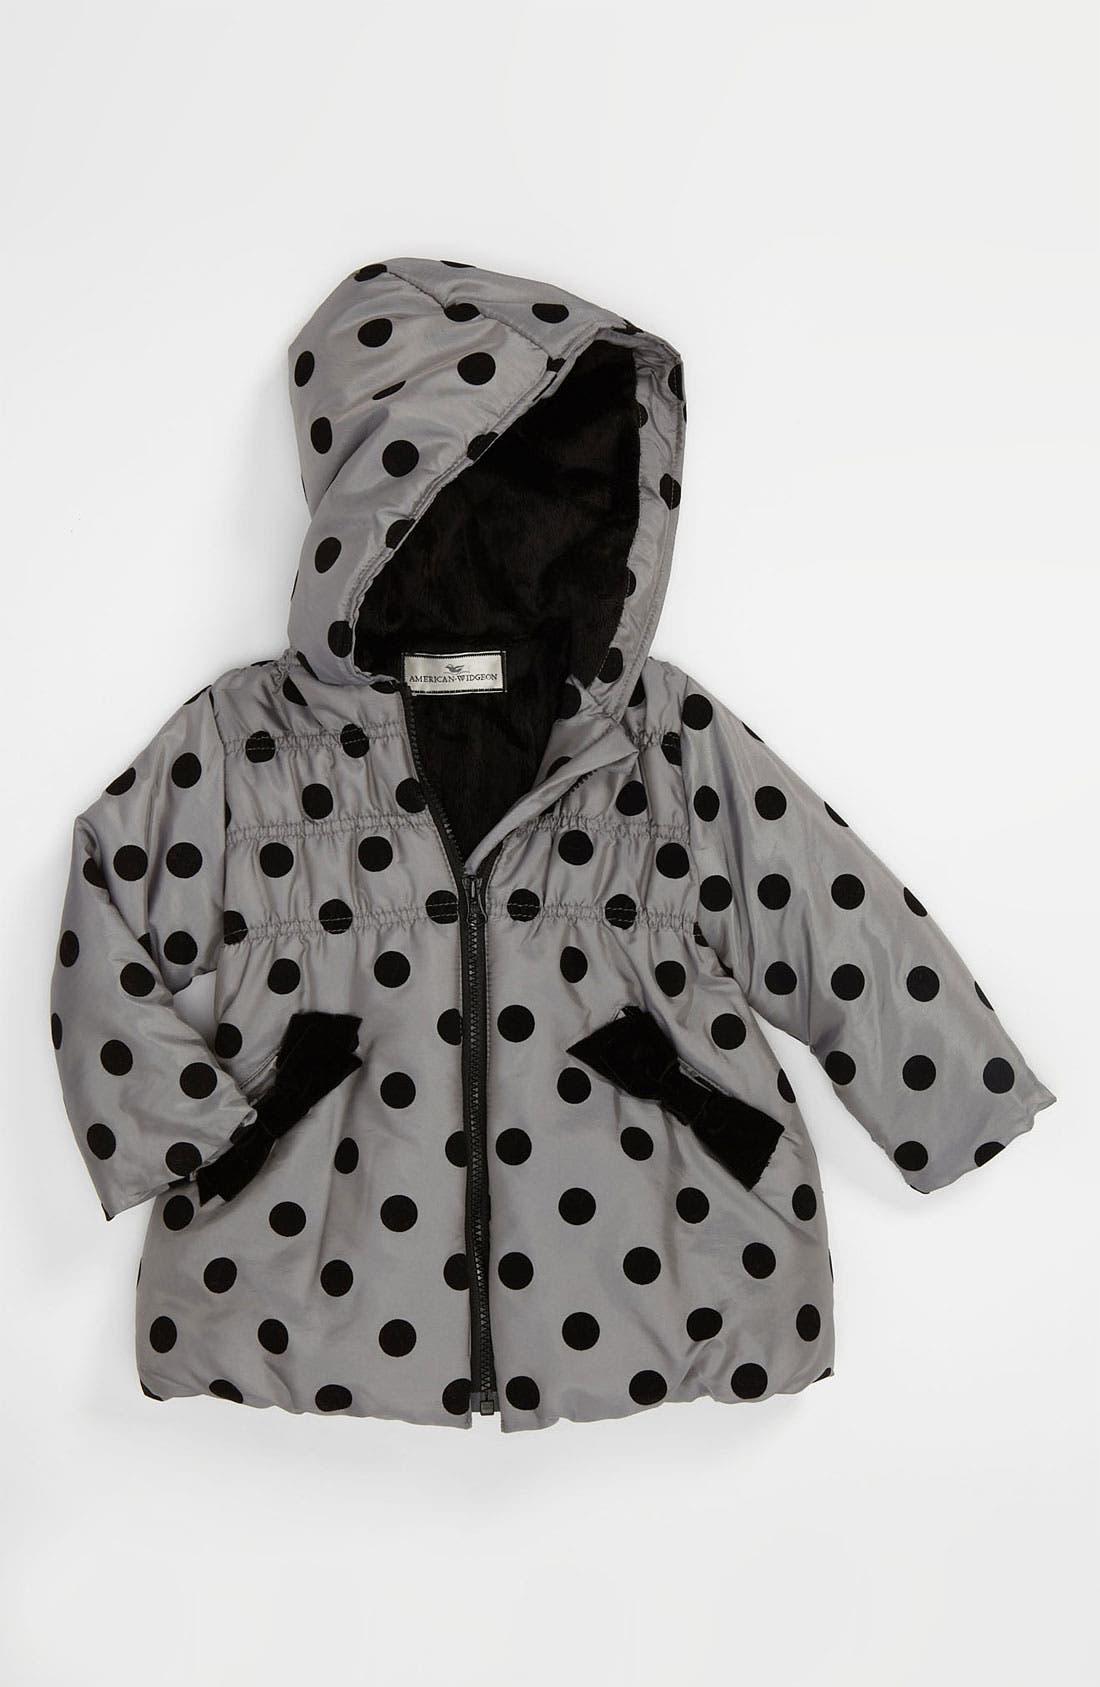 Alternate Image 1 Selected - Widgeon Polka Dot Coat (Toddler)